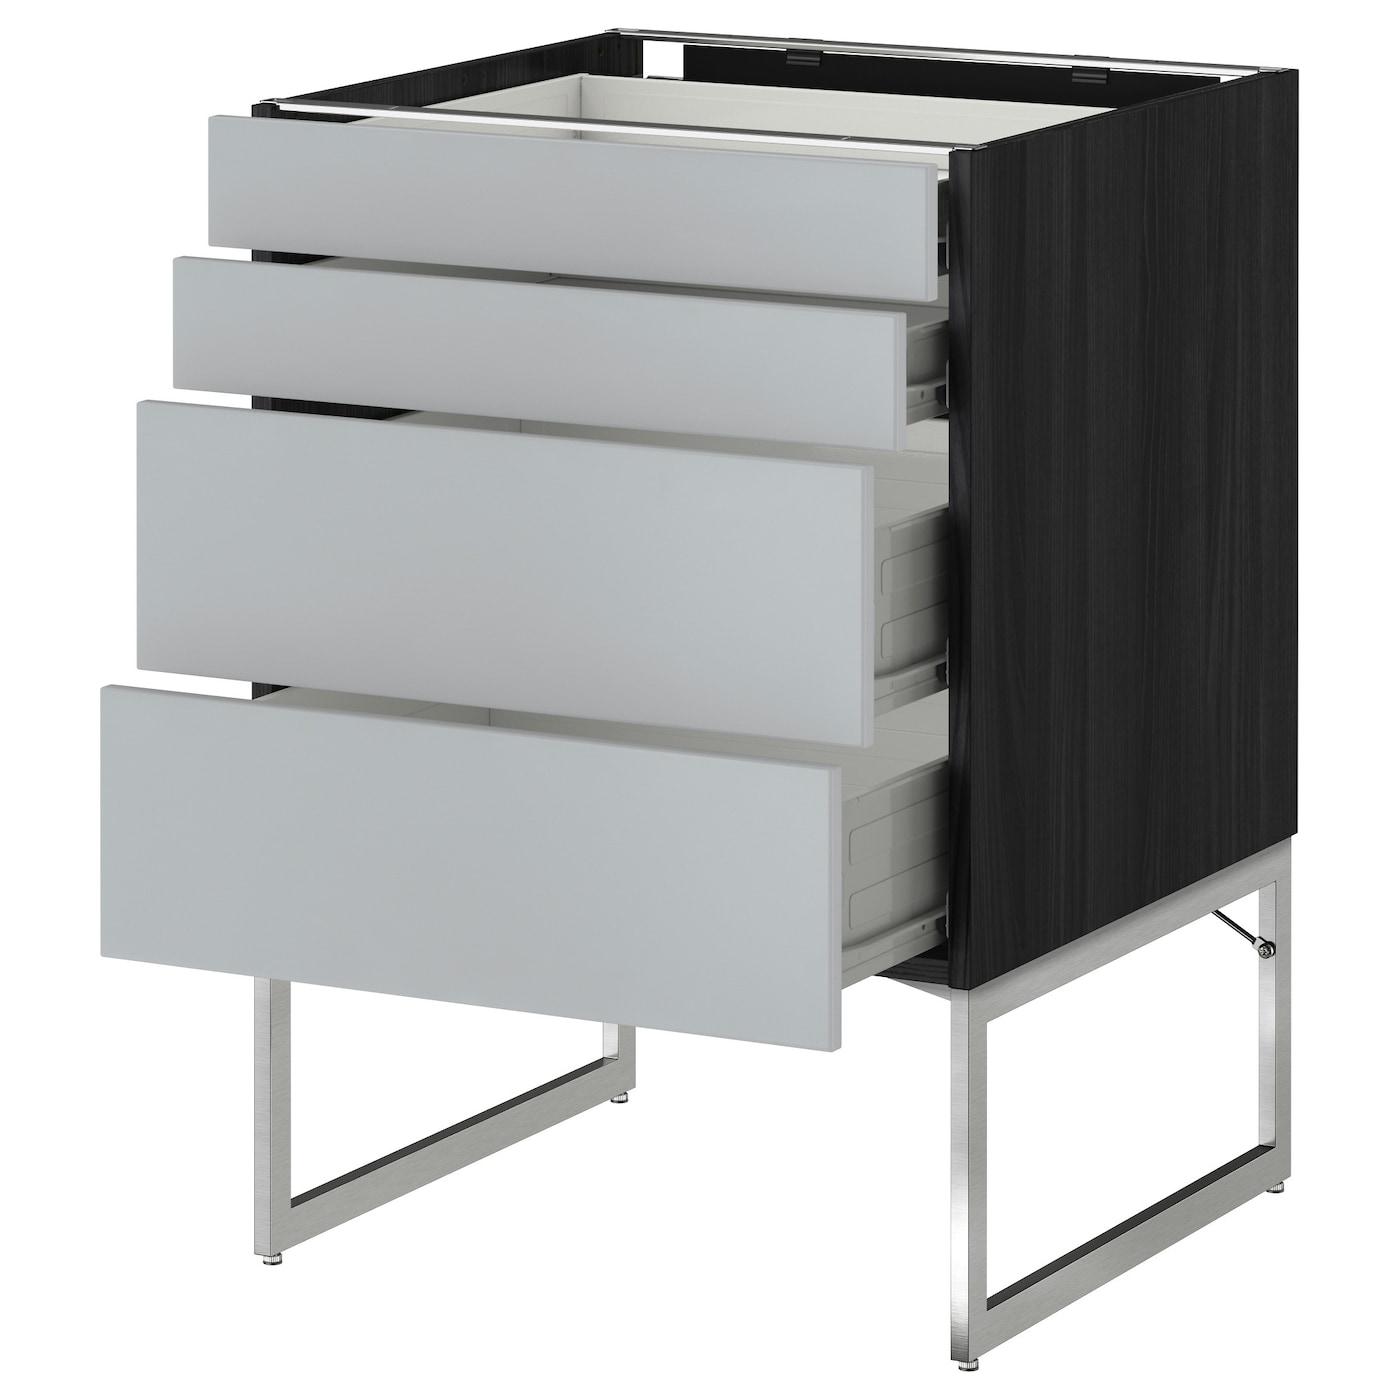 metod-forvara-uschr-fr-ni-haho-sch-schwarz__0265554_PE396991_S5 Frais De Bar Ikea Cuisine Concept